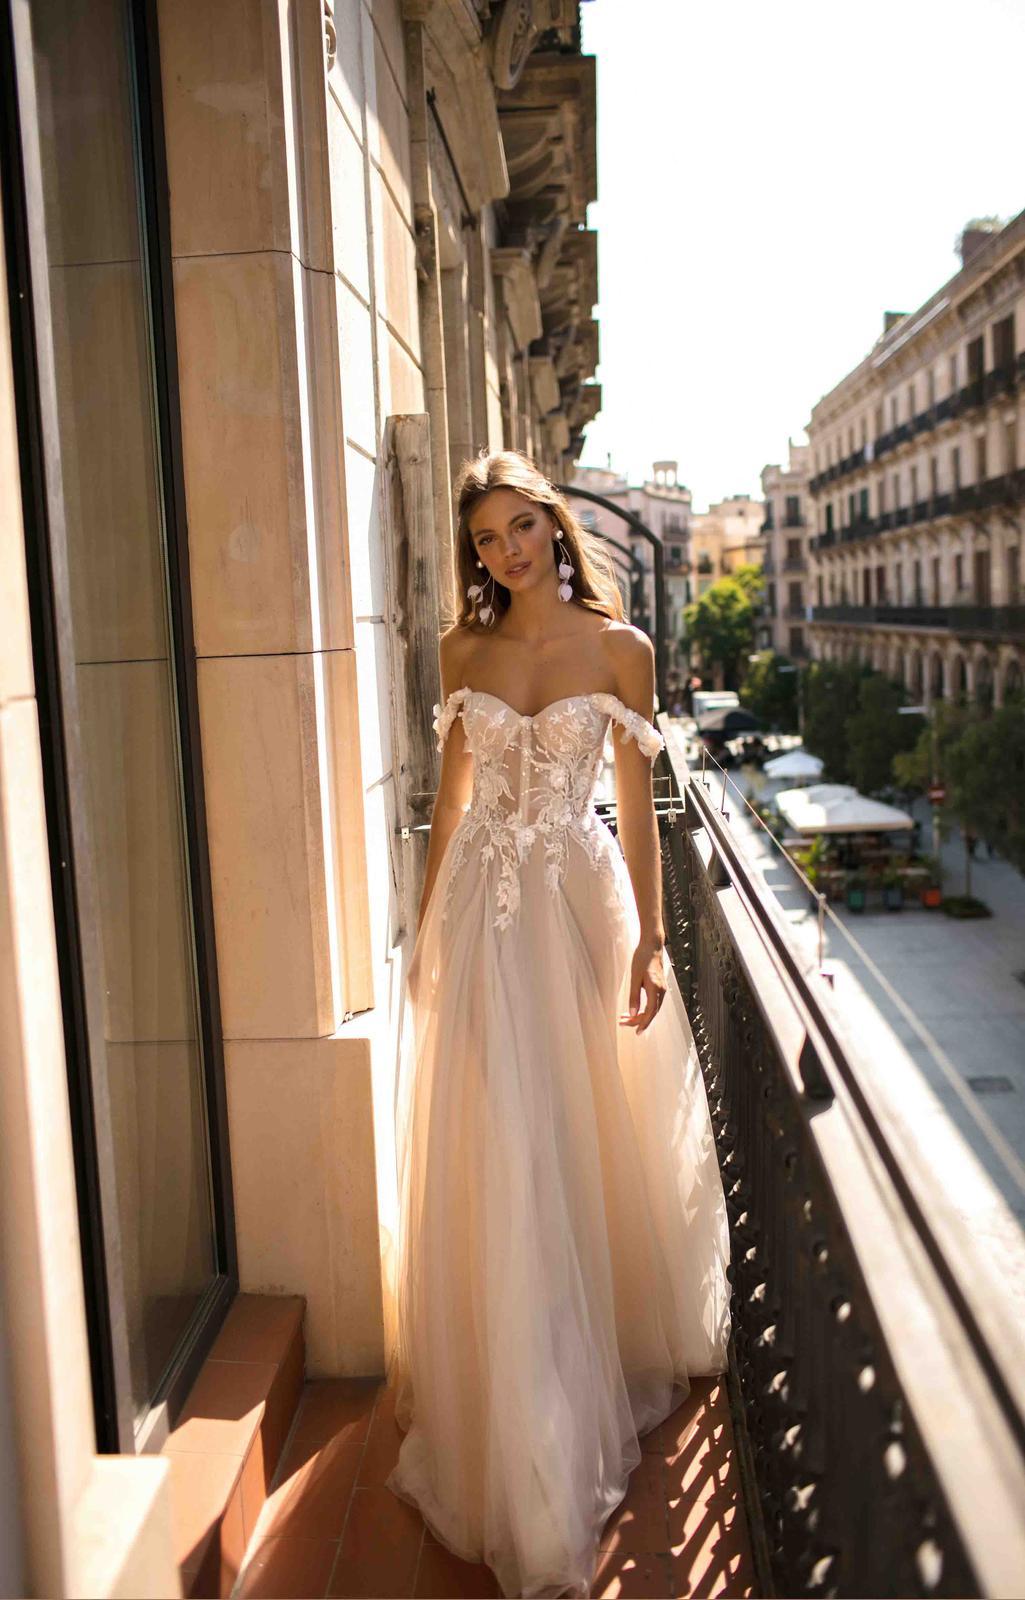 Muse by Berta * Svadobné šaty z kolekcií na rok 2019 - Obrázok č. 10